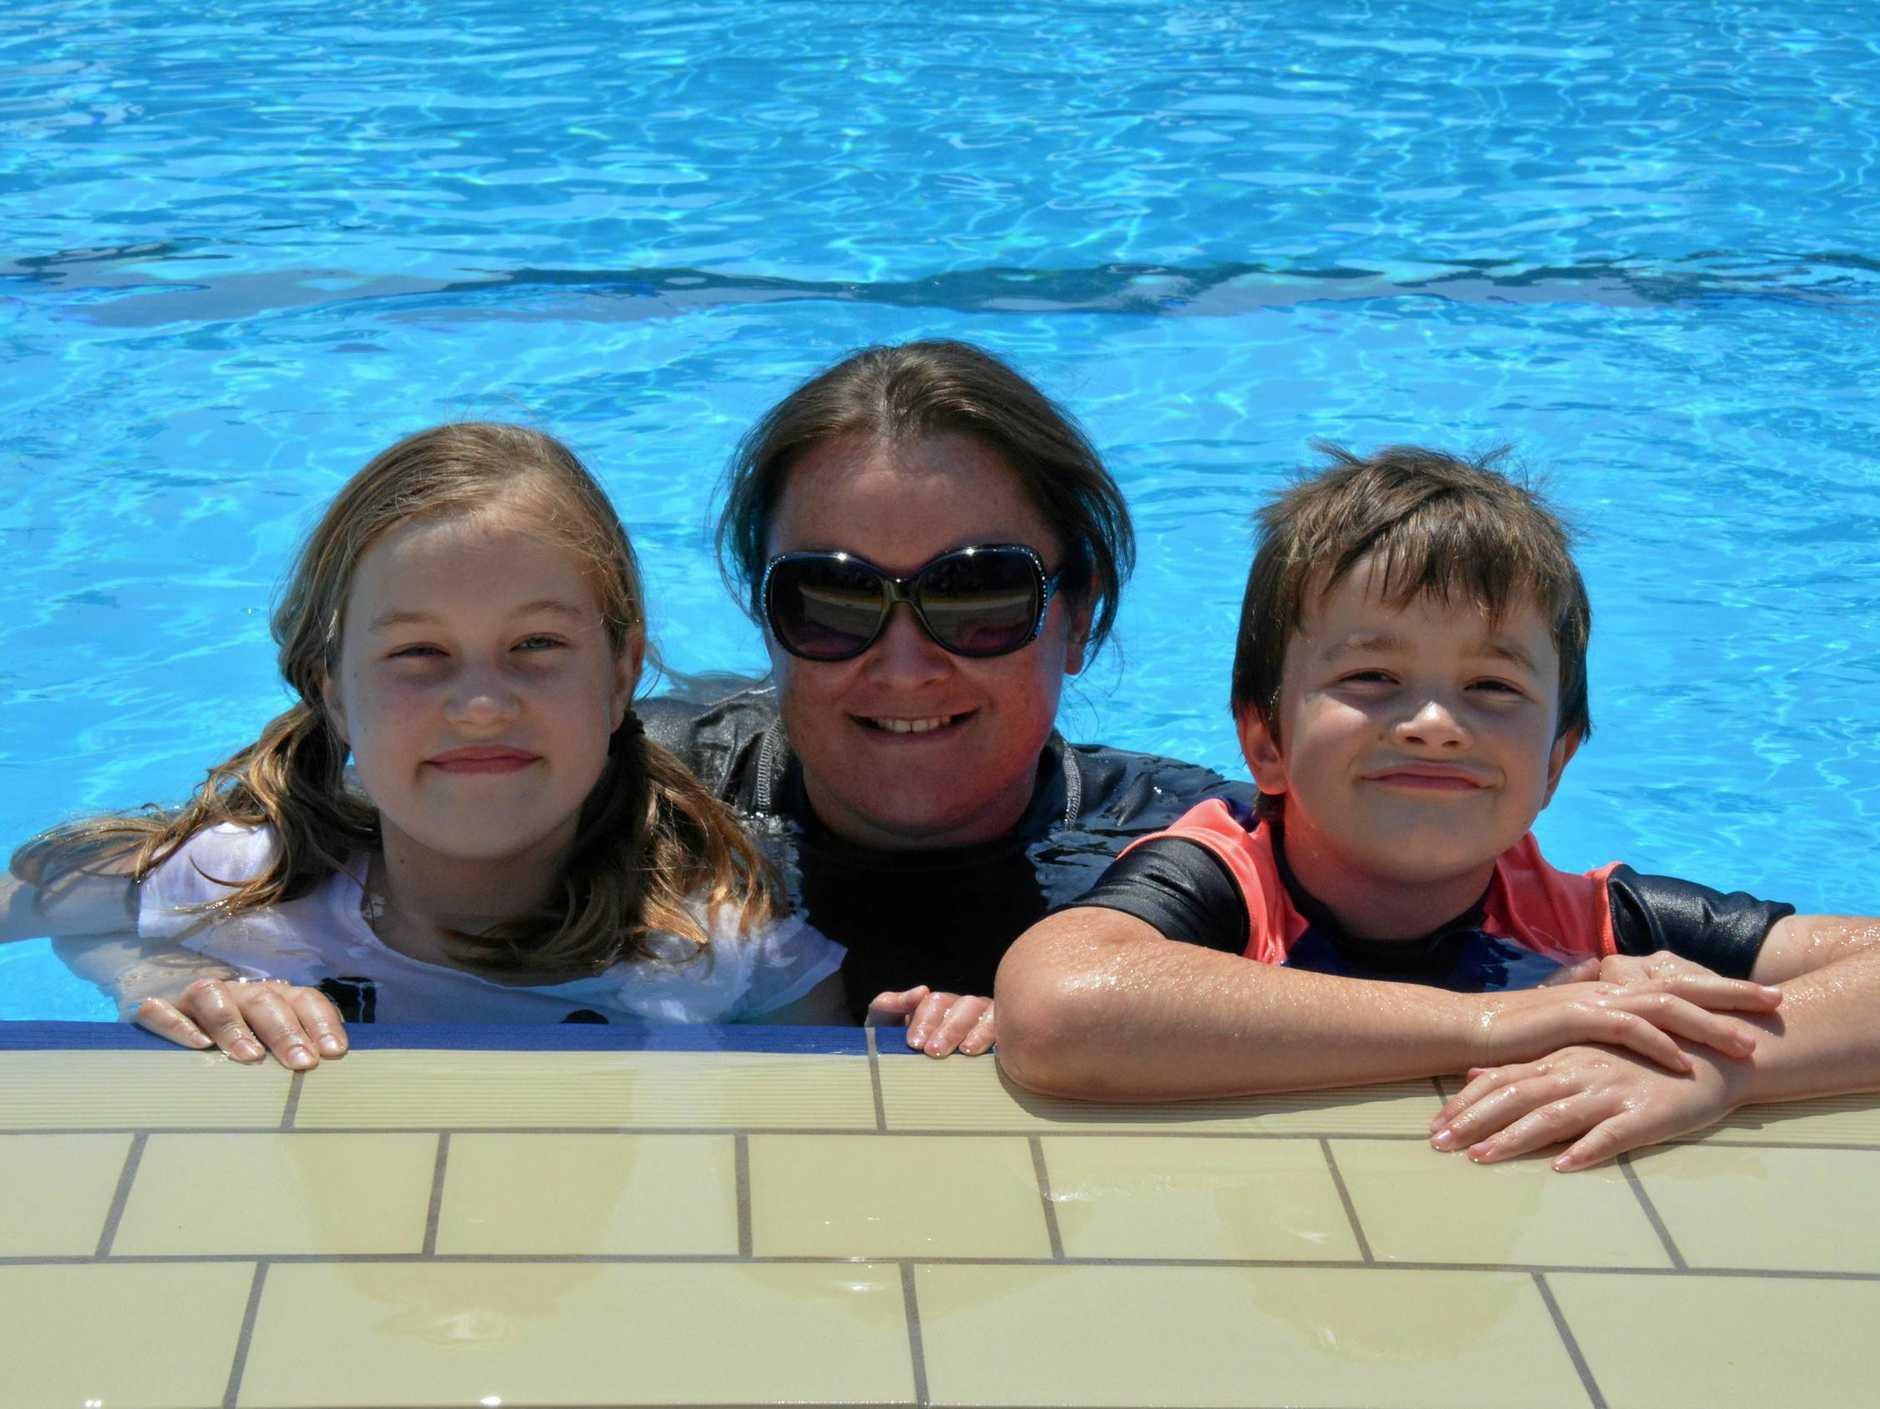 Jemima, Elisha and Reuben Wolter at Kingaroy pool.